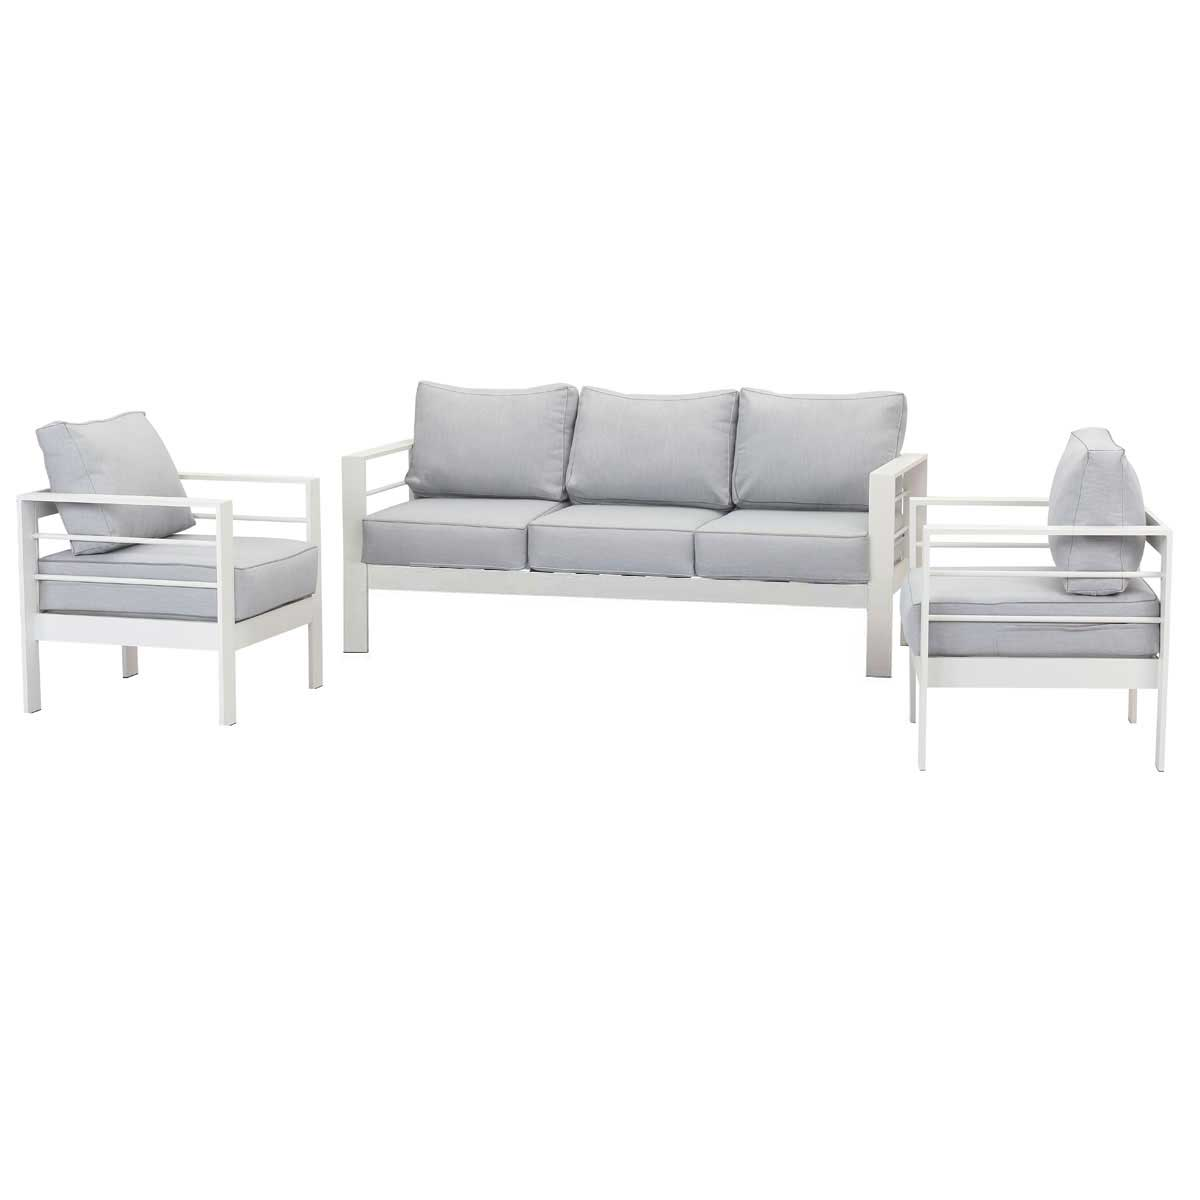 Paris 5 Seater White Aluminium Sofa Lounge - Light Grey Cushion